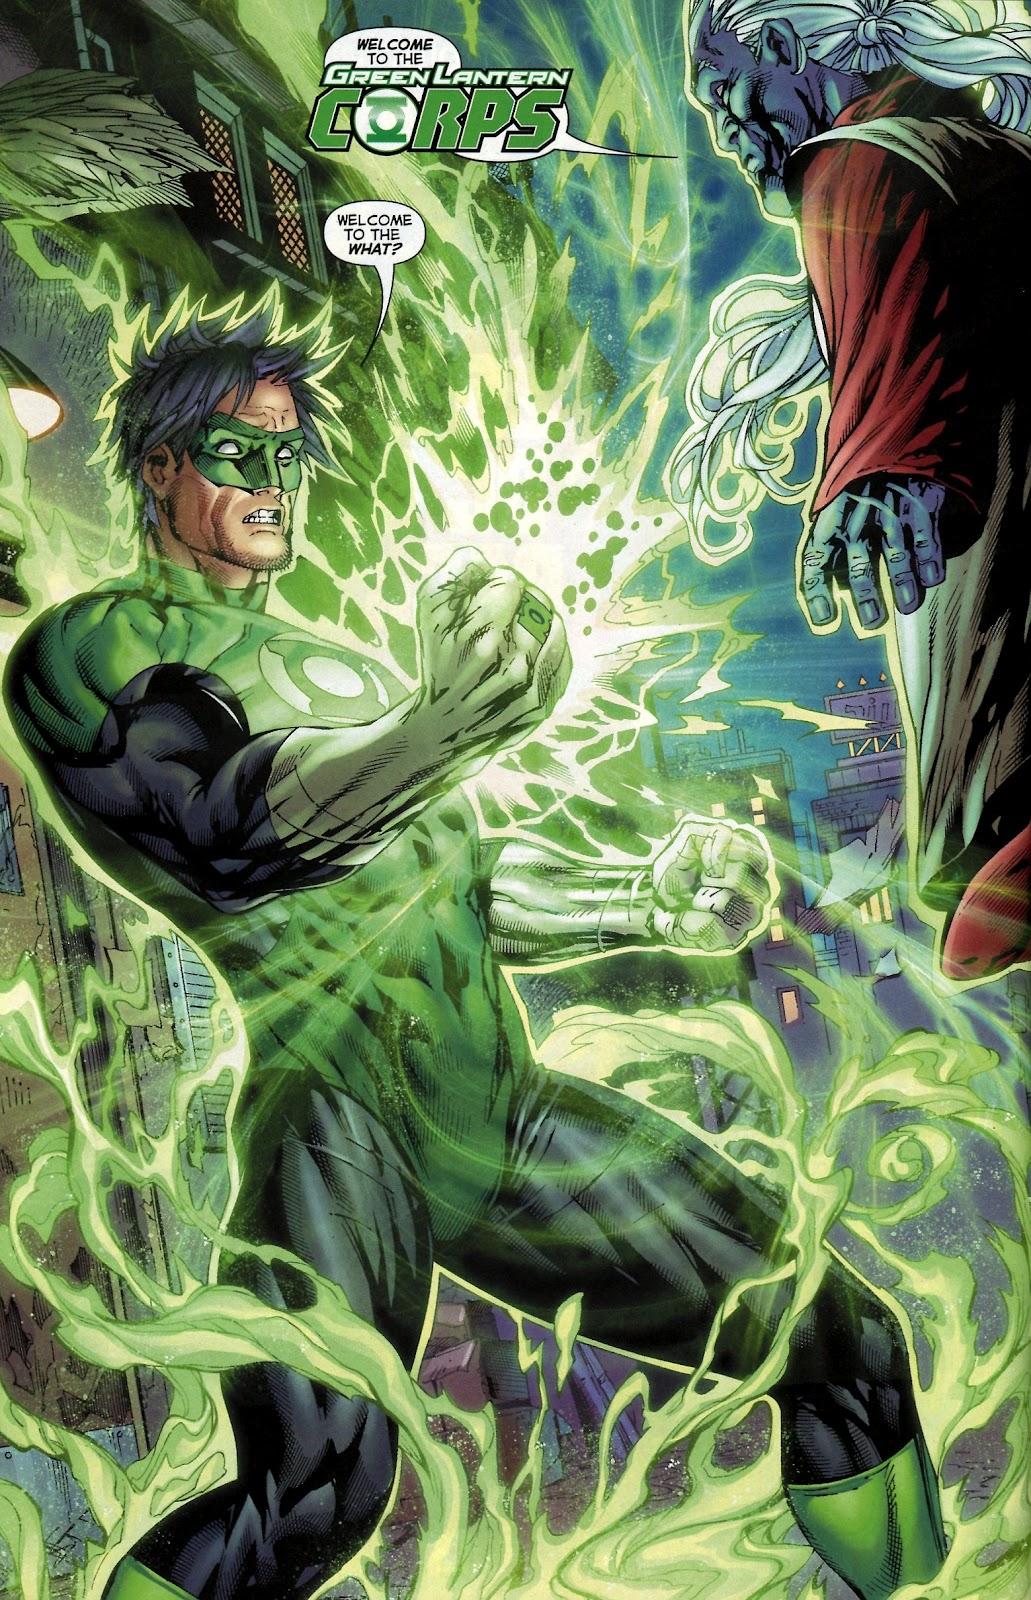 52 Photos 37 Reviews: Super-DuperToyBox: New 52 Green Lantern: New Guardians #1 & #2